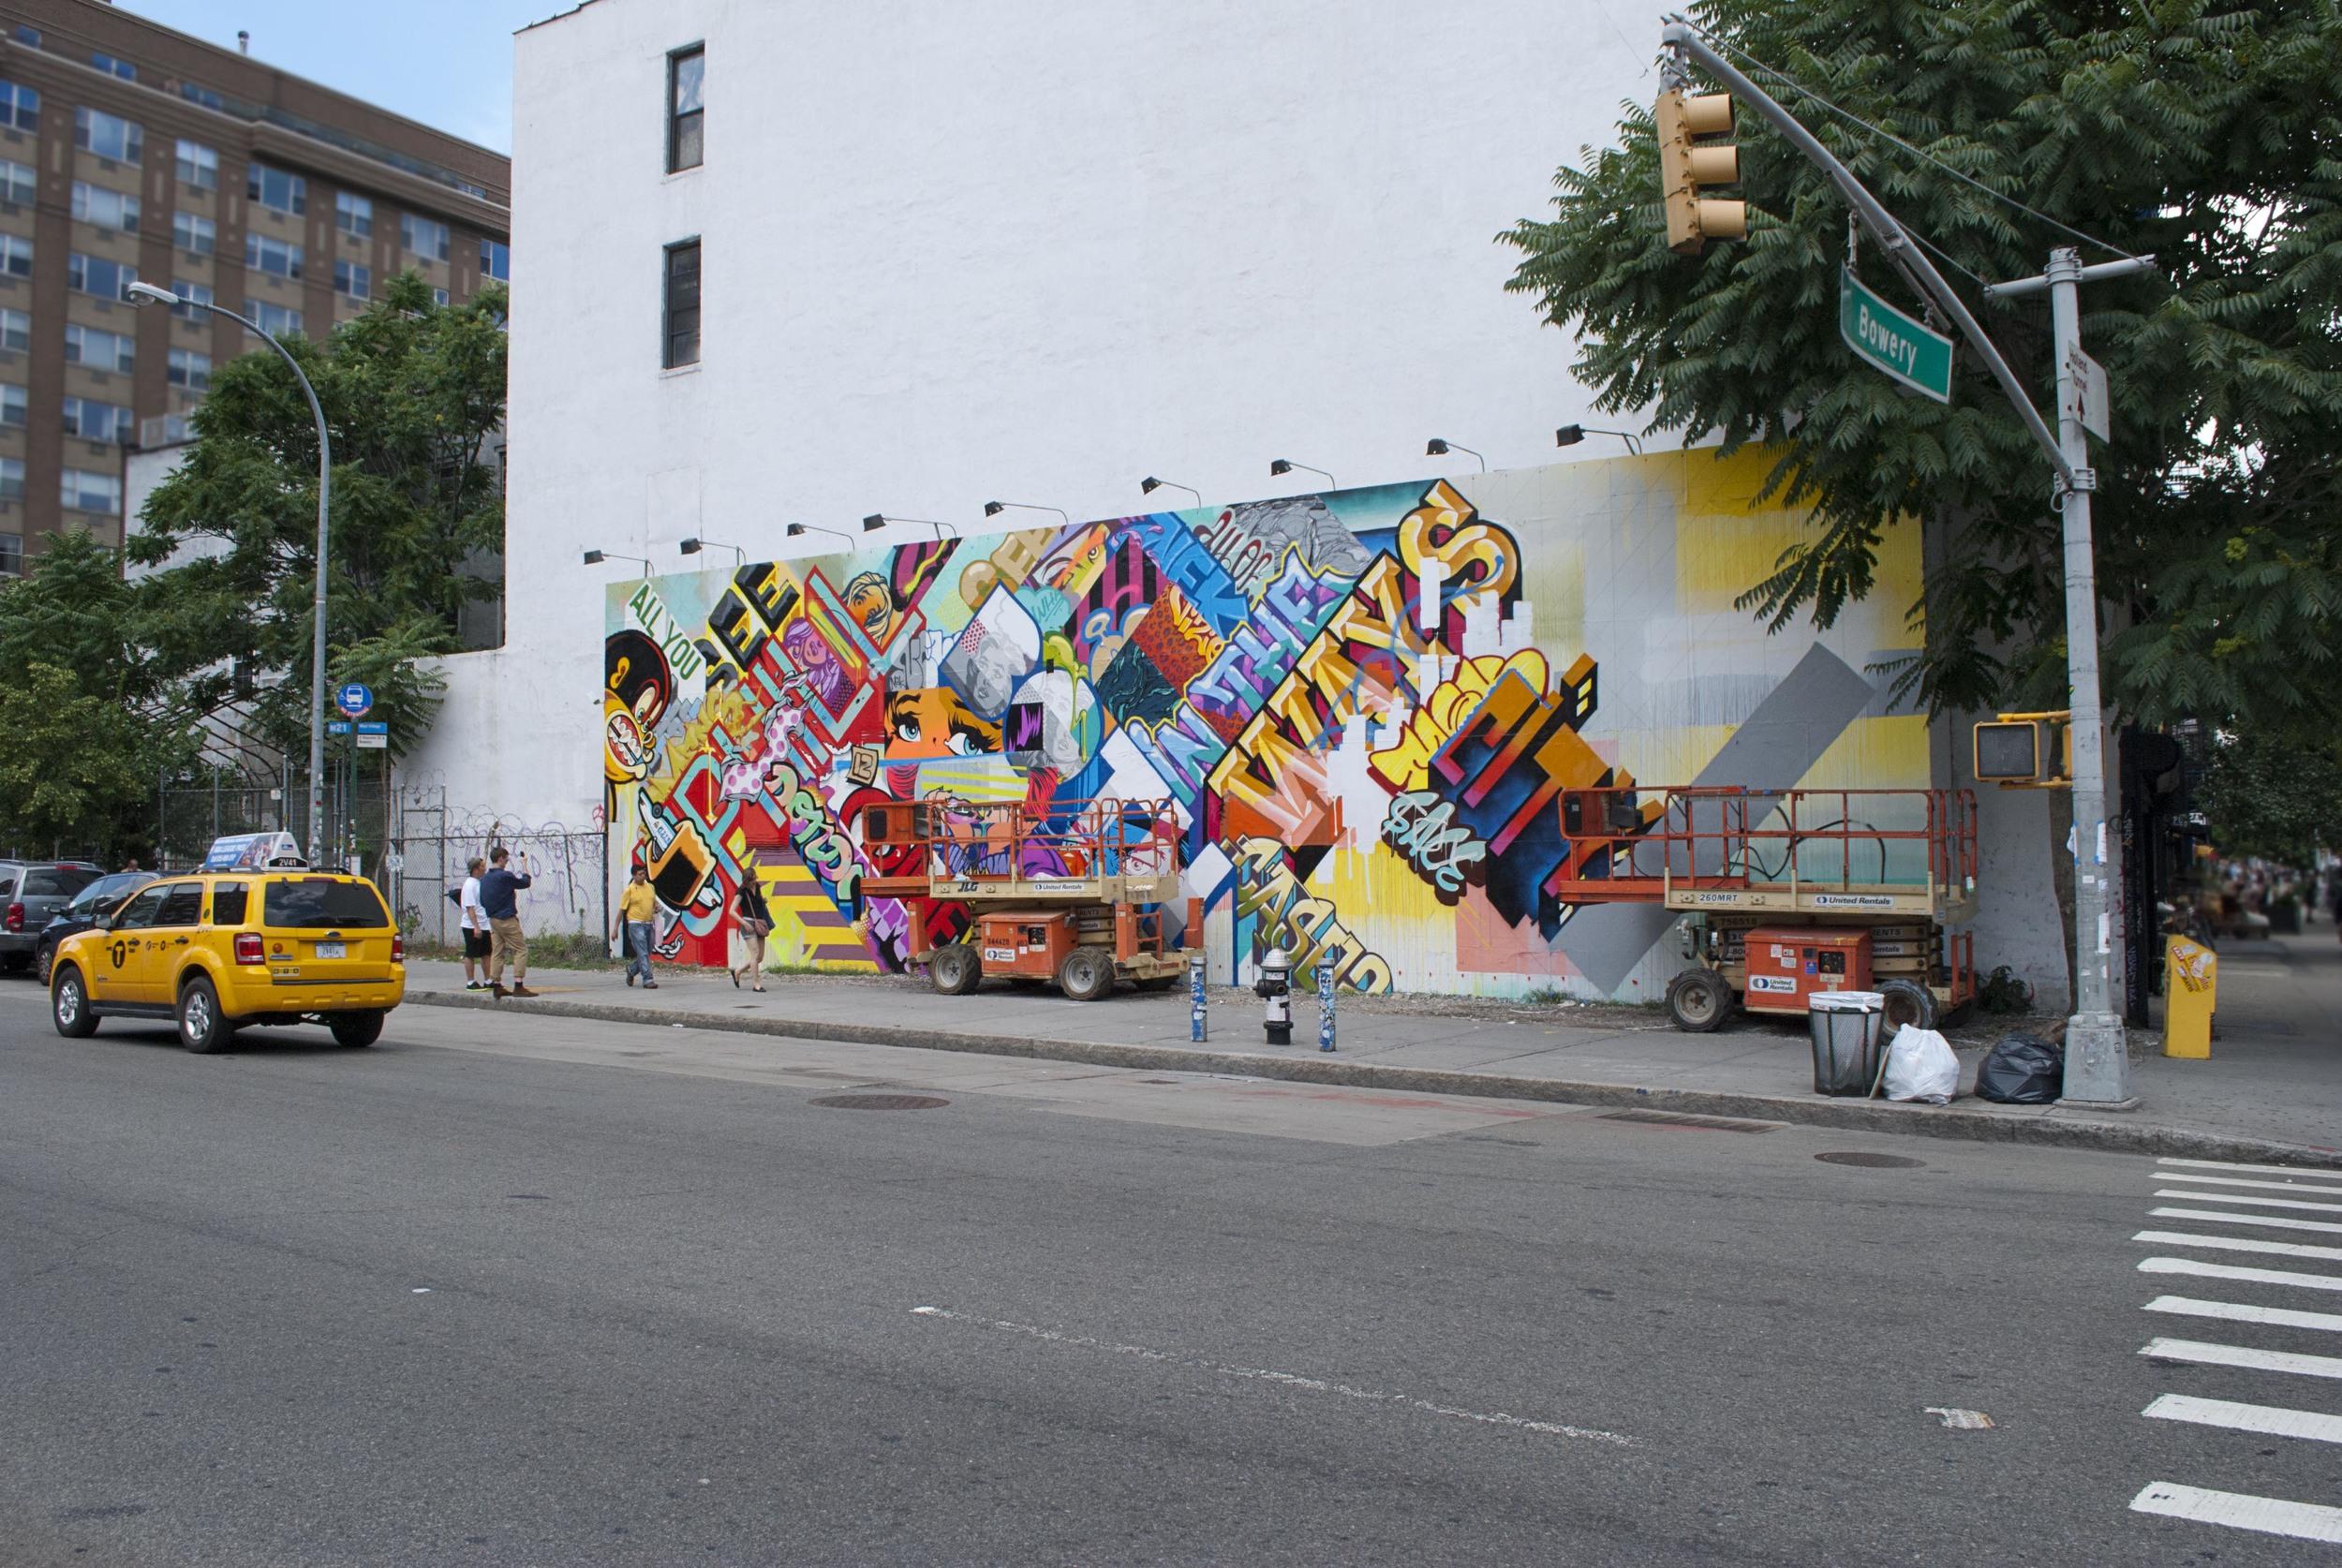 Houston-Bowery-mural-revok-pose